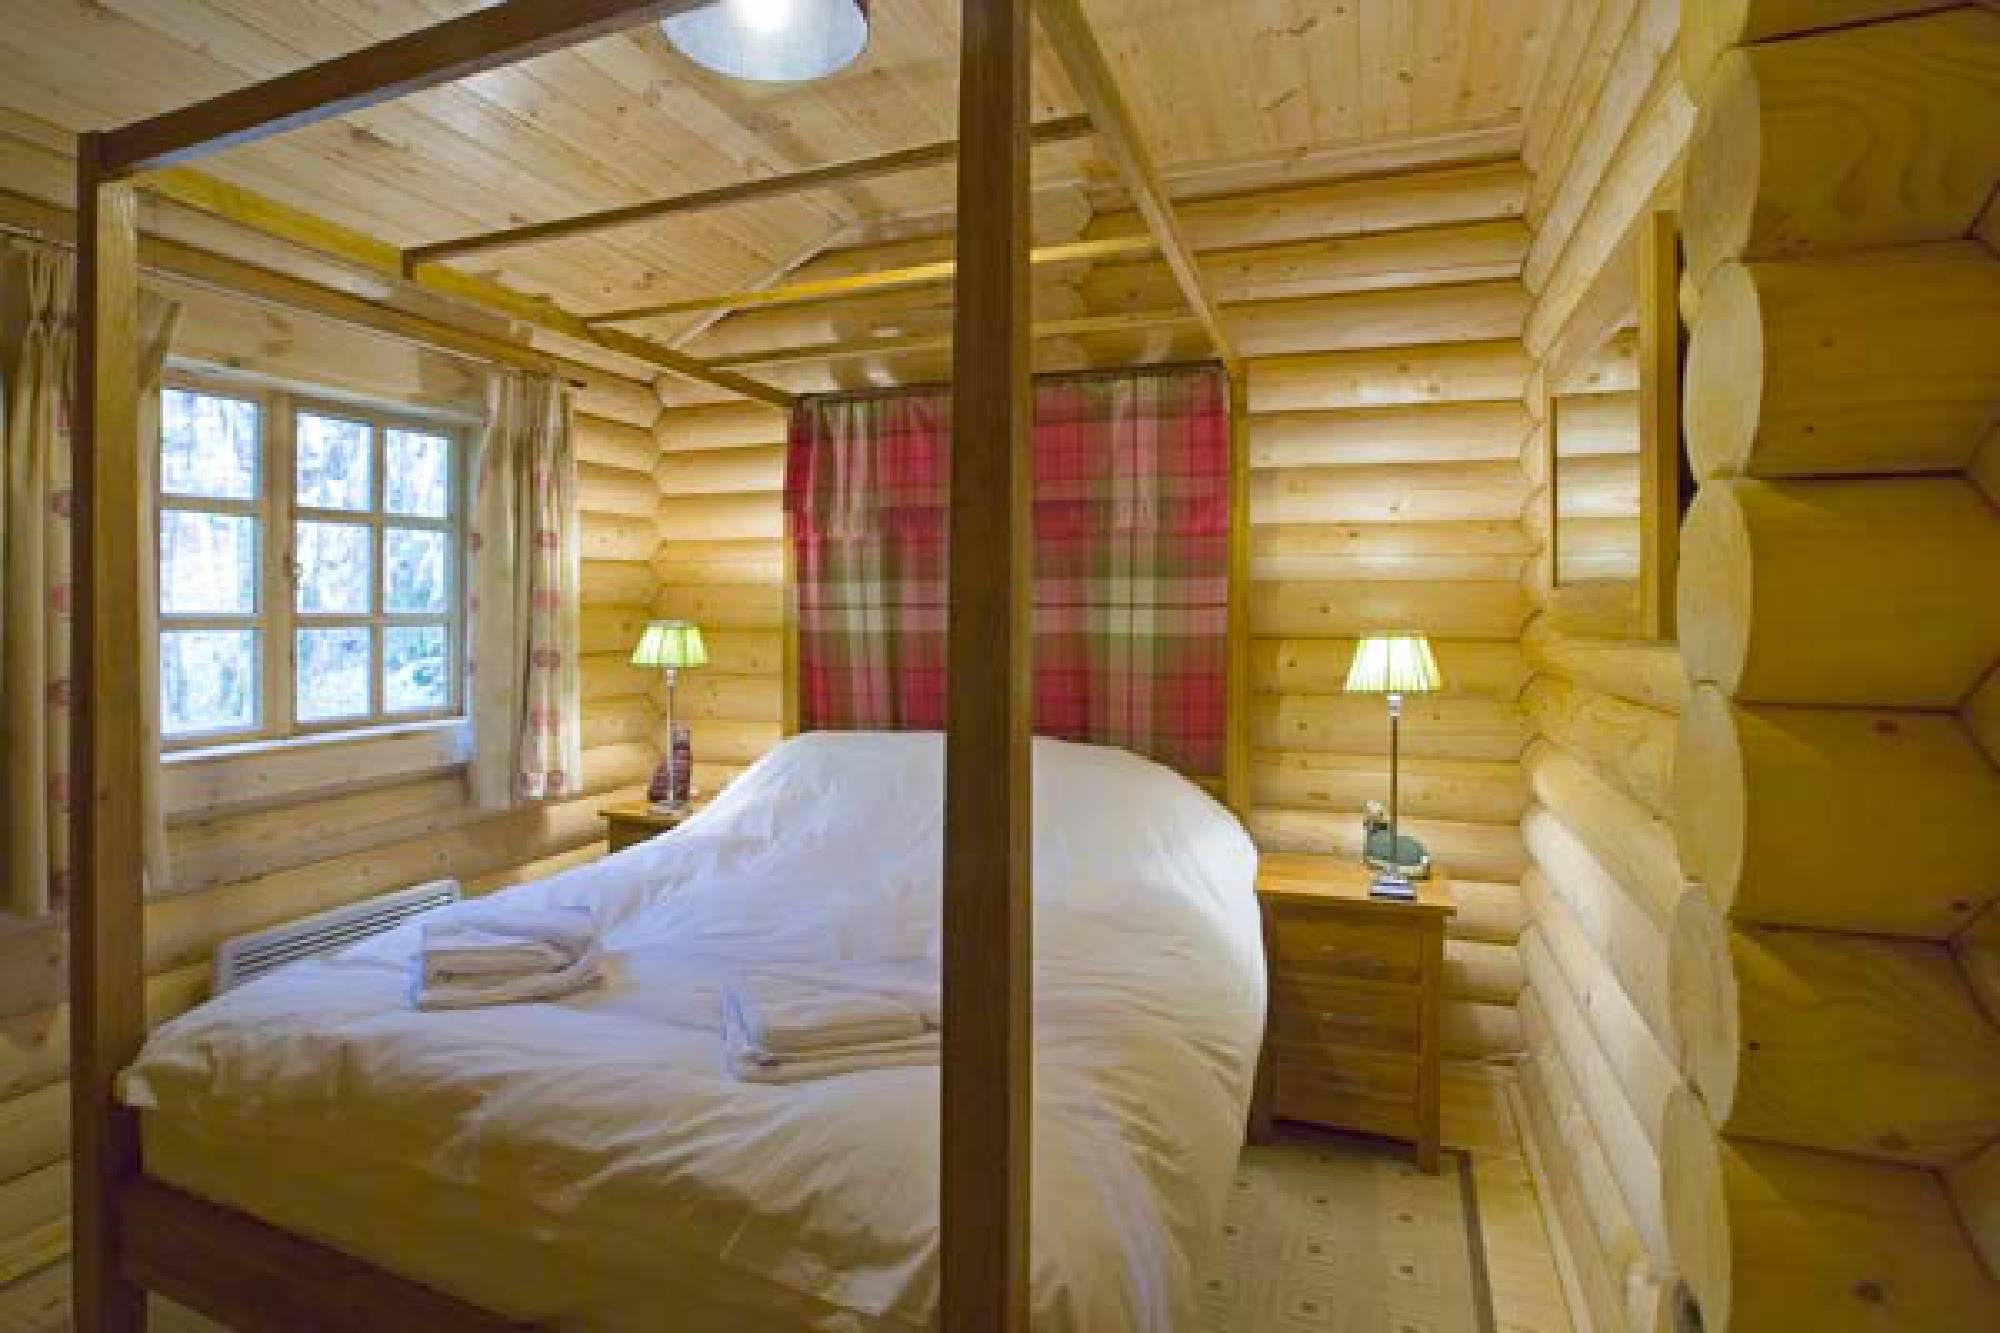 Black Grouse Log Cabin sleeps 2 in comfort